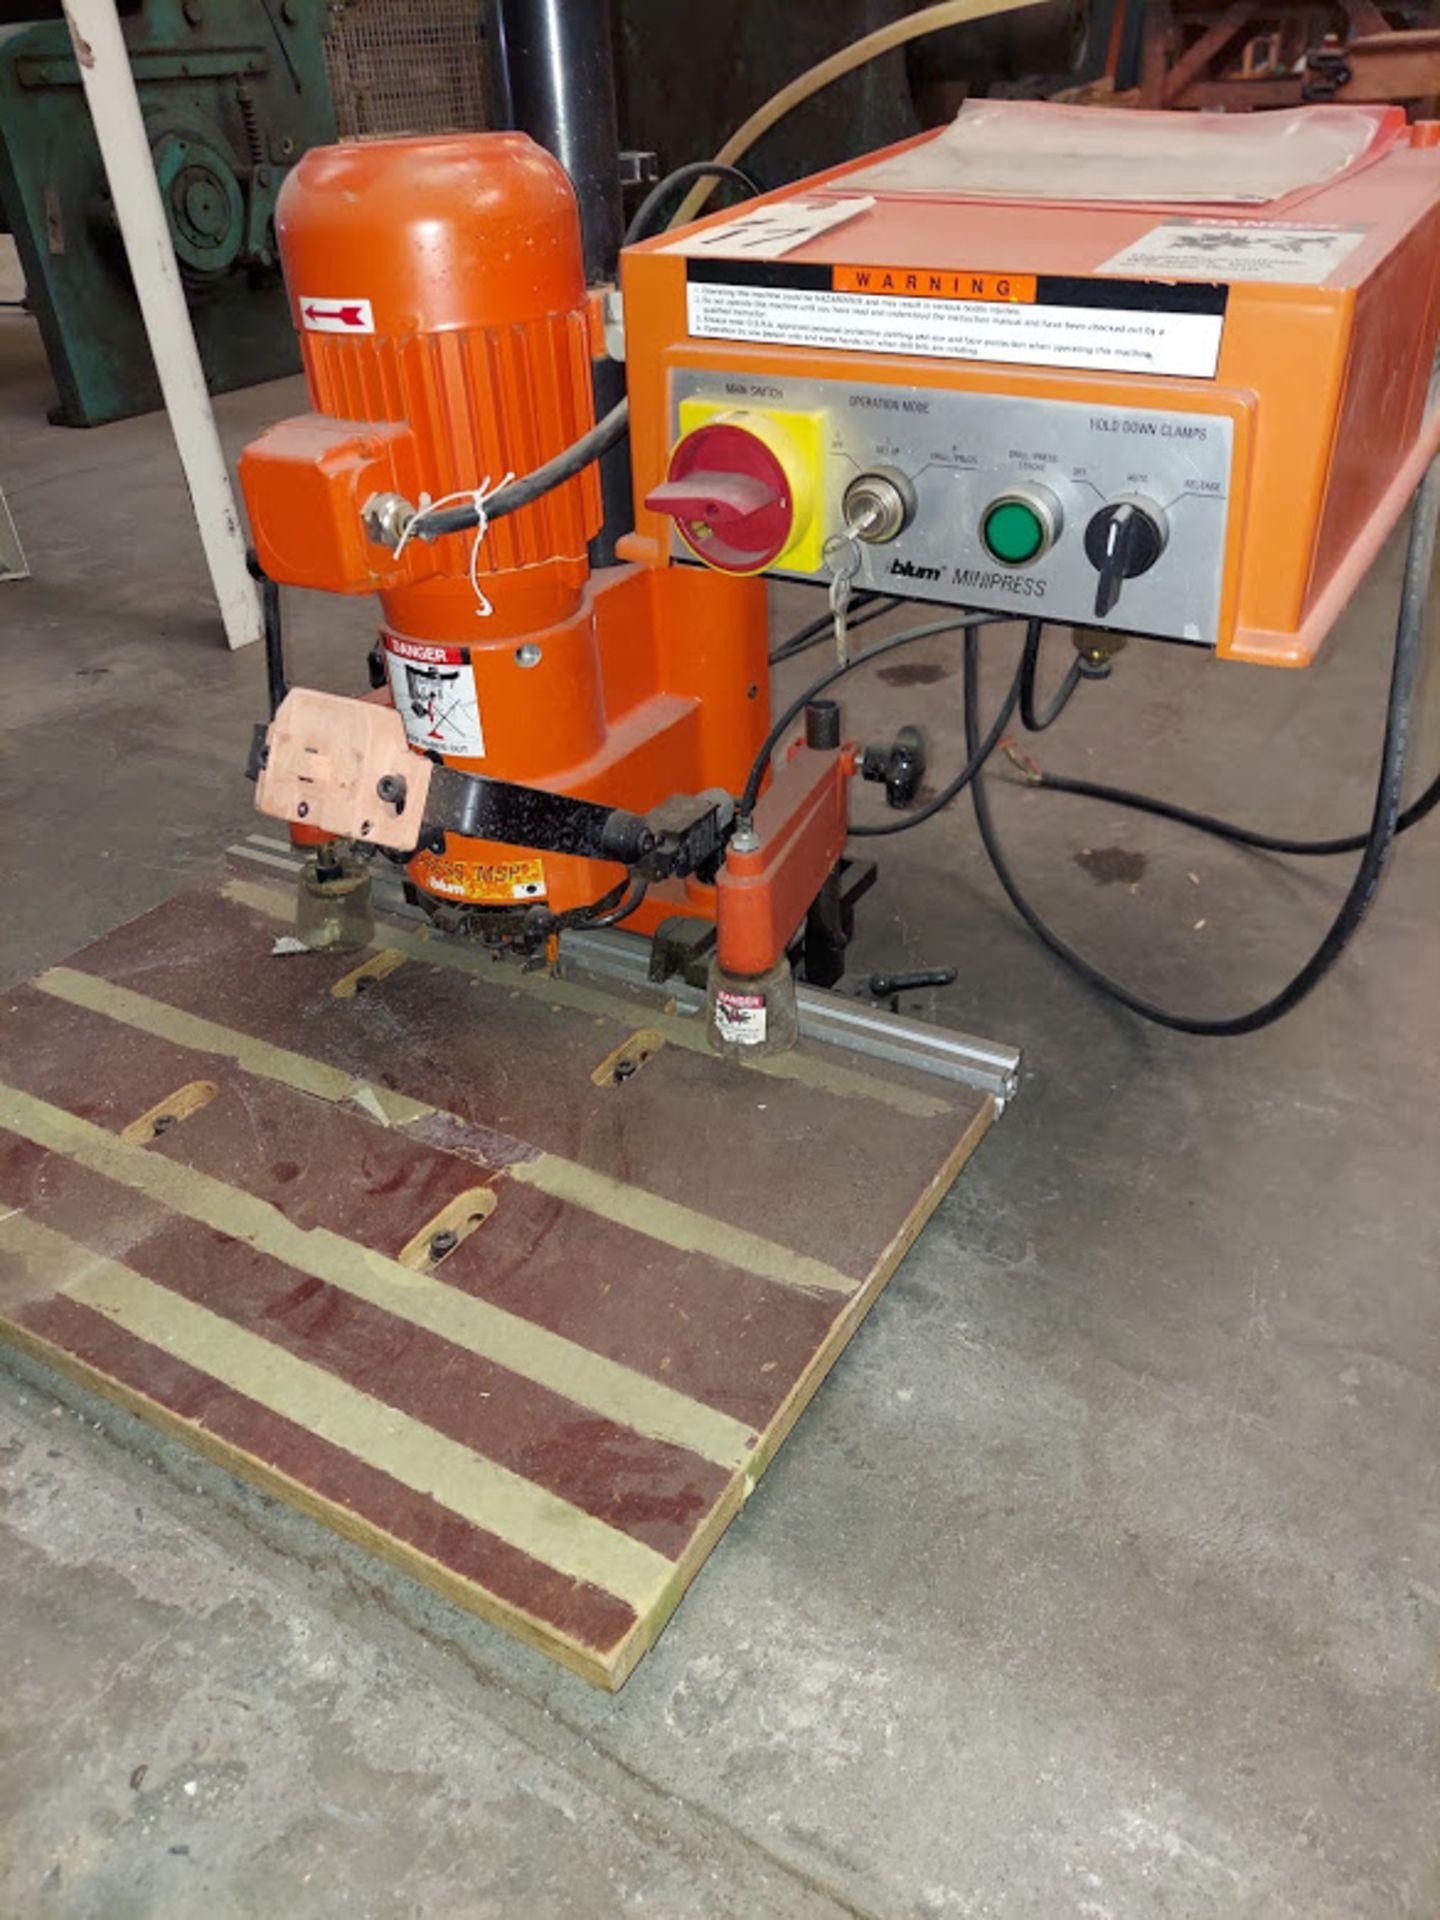 Blum Hinge Boring Machine, Ref #M51N1004 , 0.75 KW 230 Volts 3 Phase - Image 2 of 4